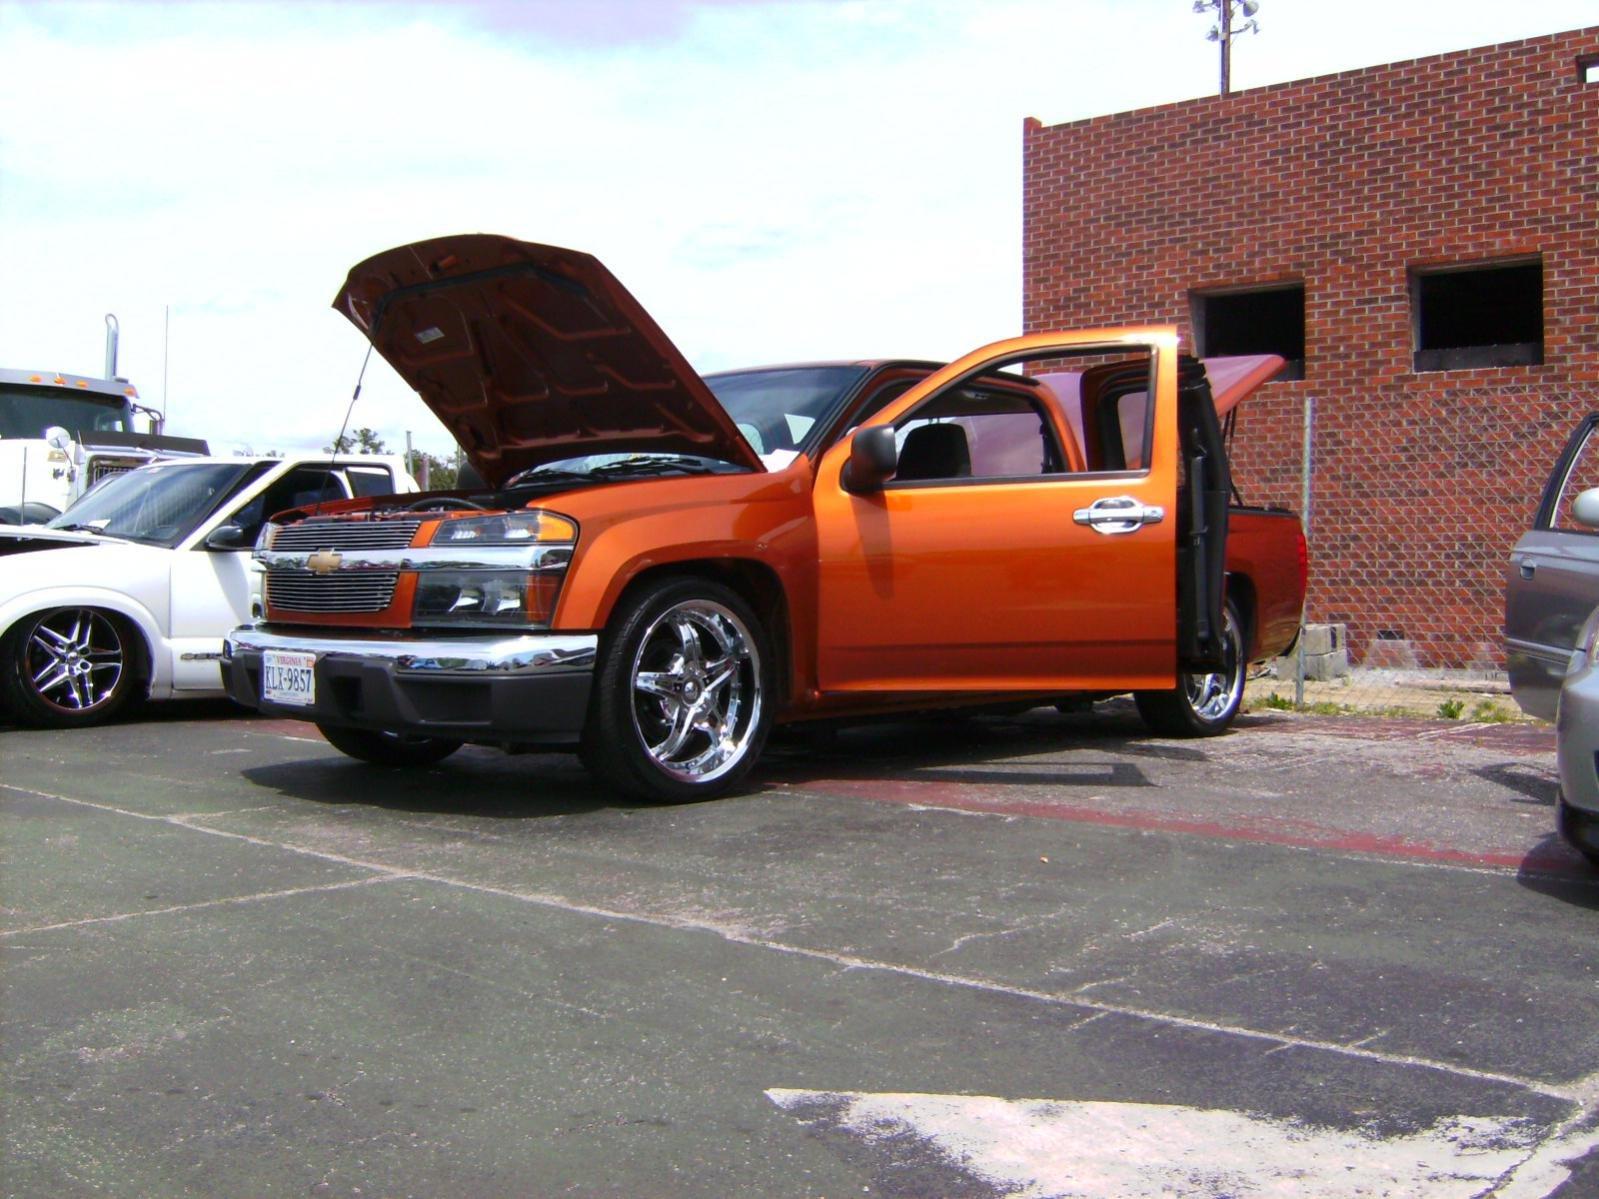 Car Show In Jacksonville NC PICS Chevrolet Colorado GMC - Car show jacksonville nc